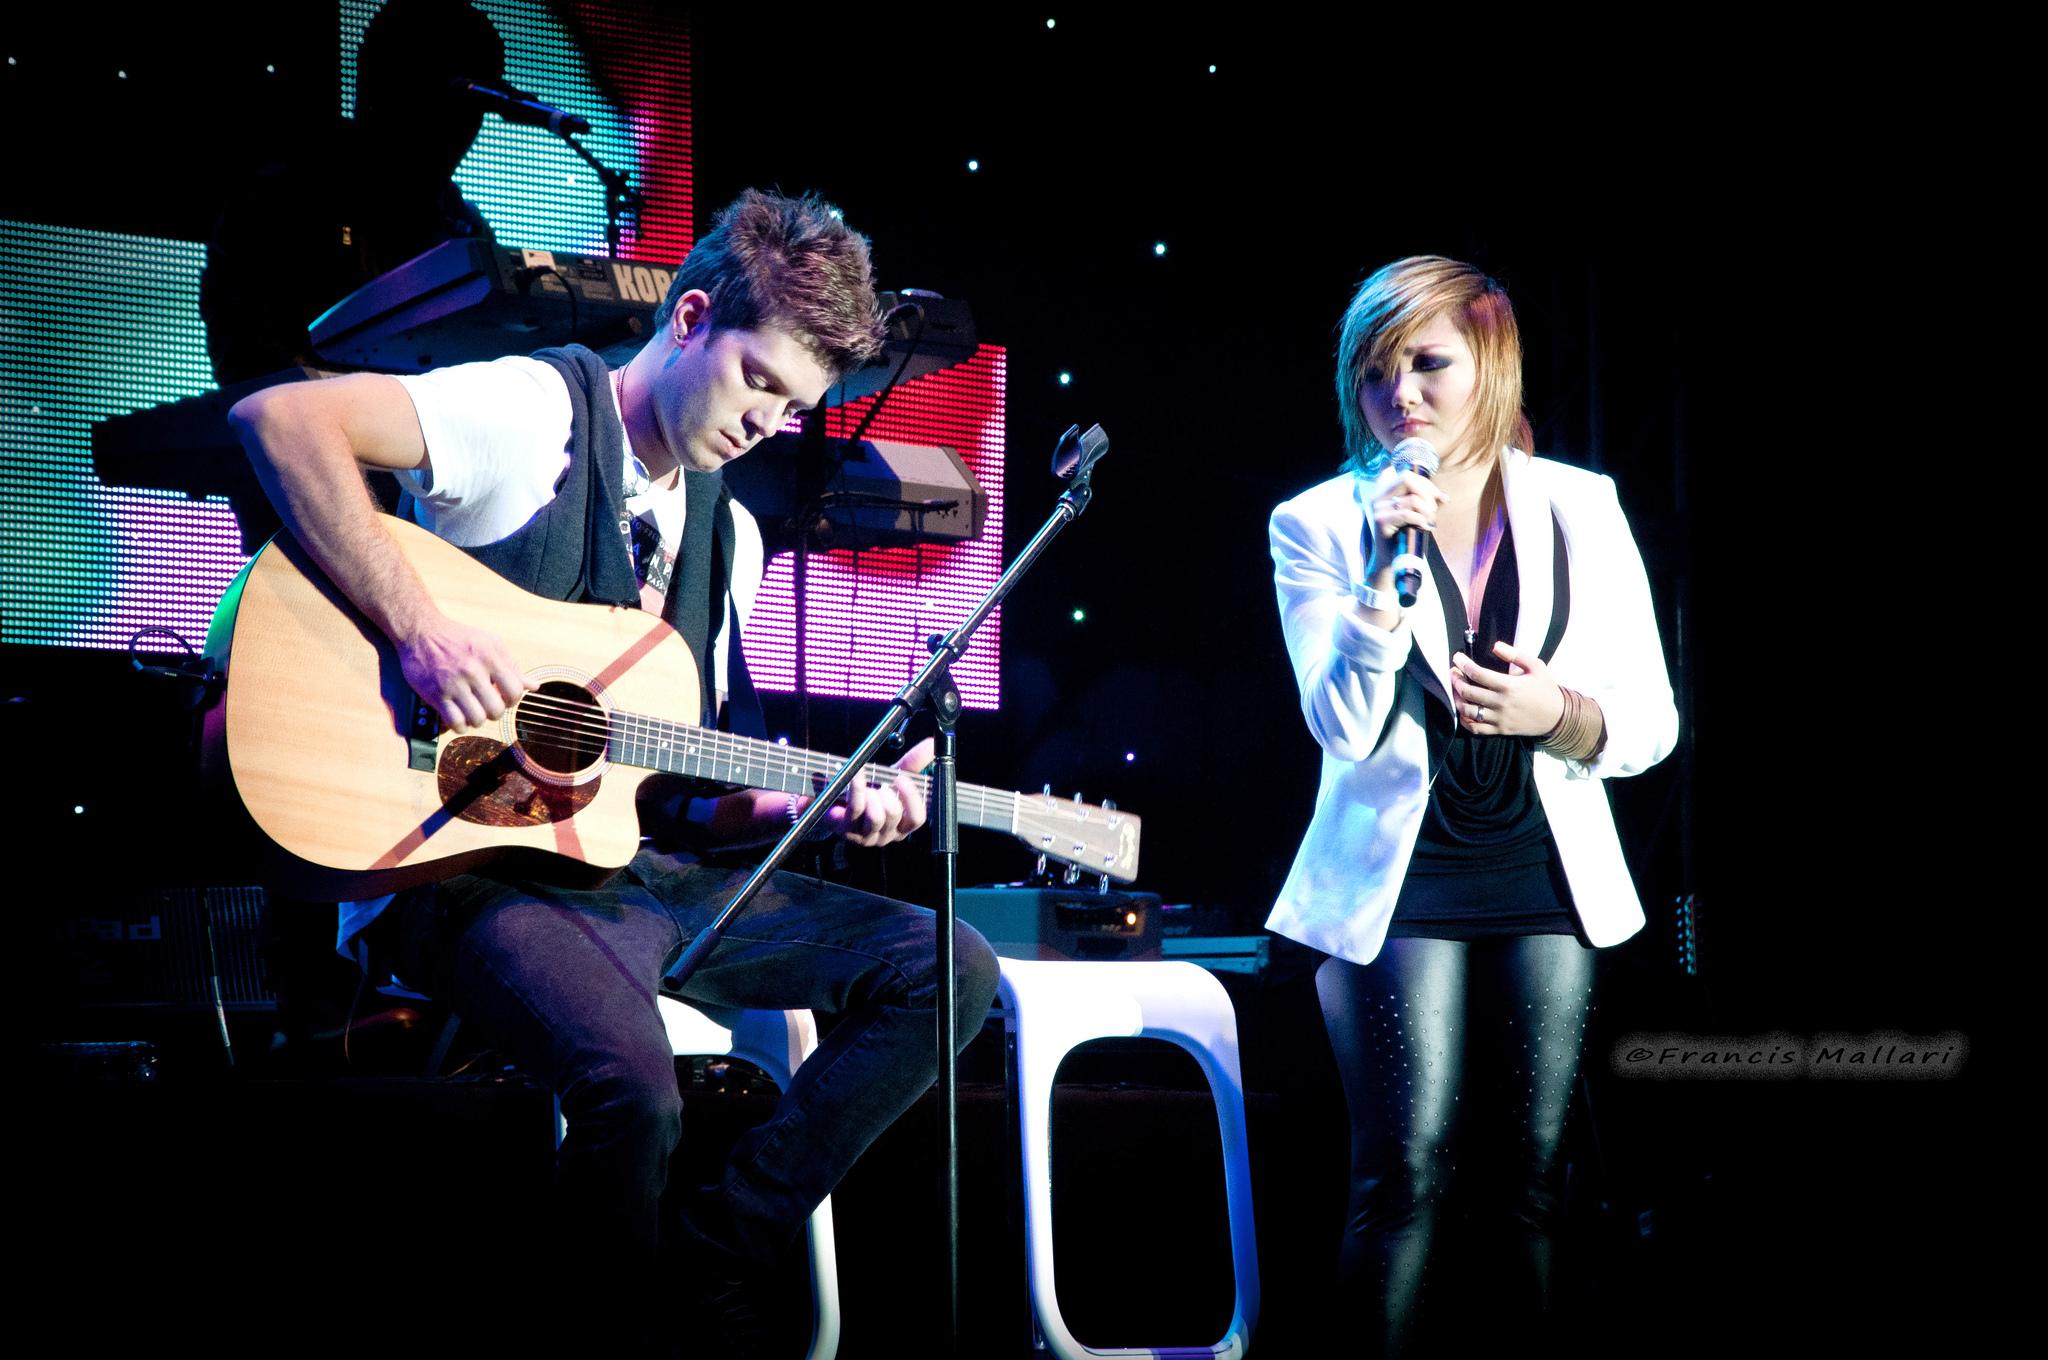 03/02/12 - Charice Infinity Asia Tour - Dubai 7158679503_d0135c3559_k